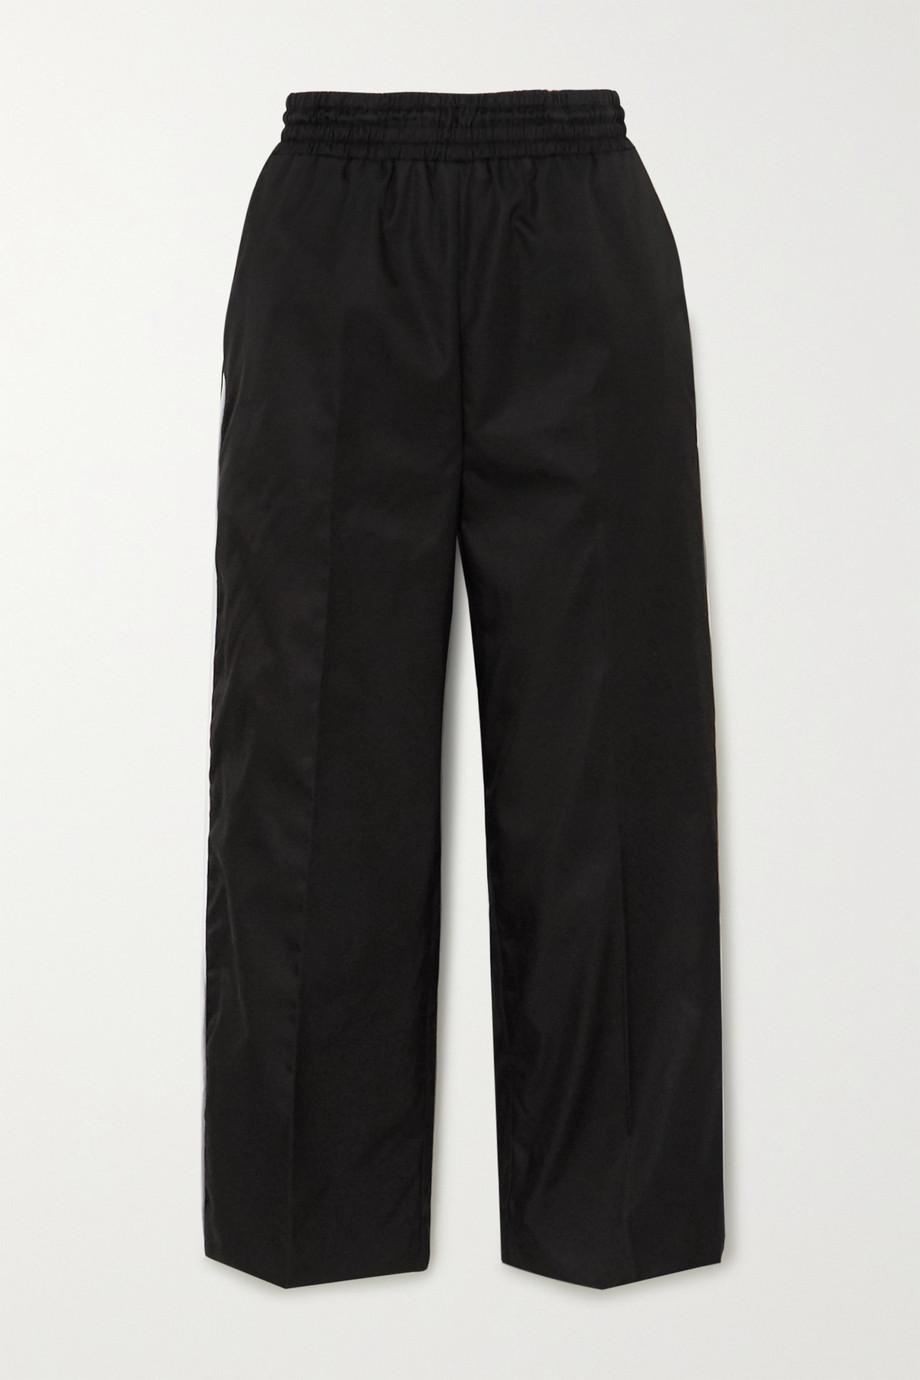 Prada Cropped appliquéd piped nylon straight-leg pants